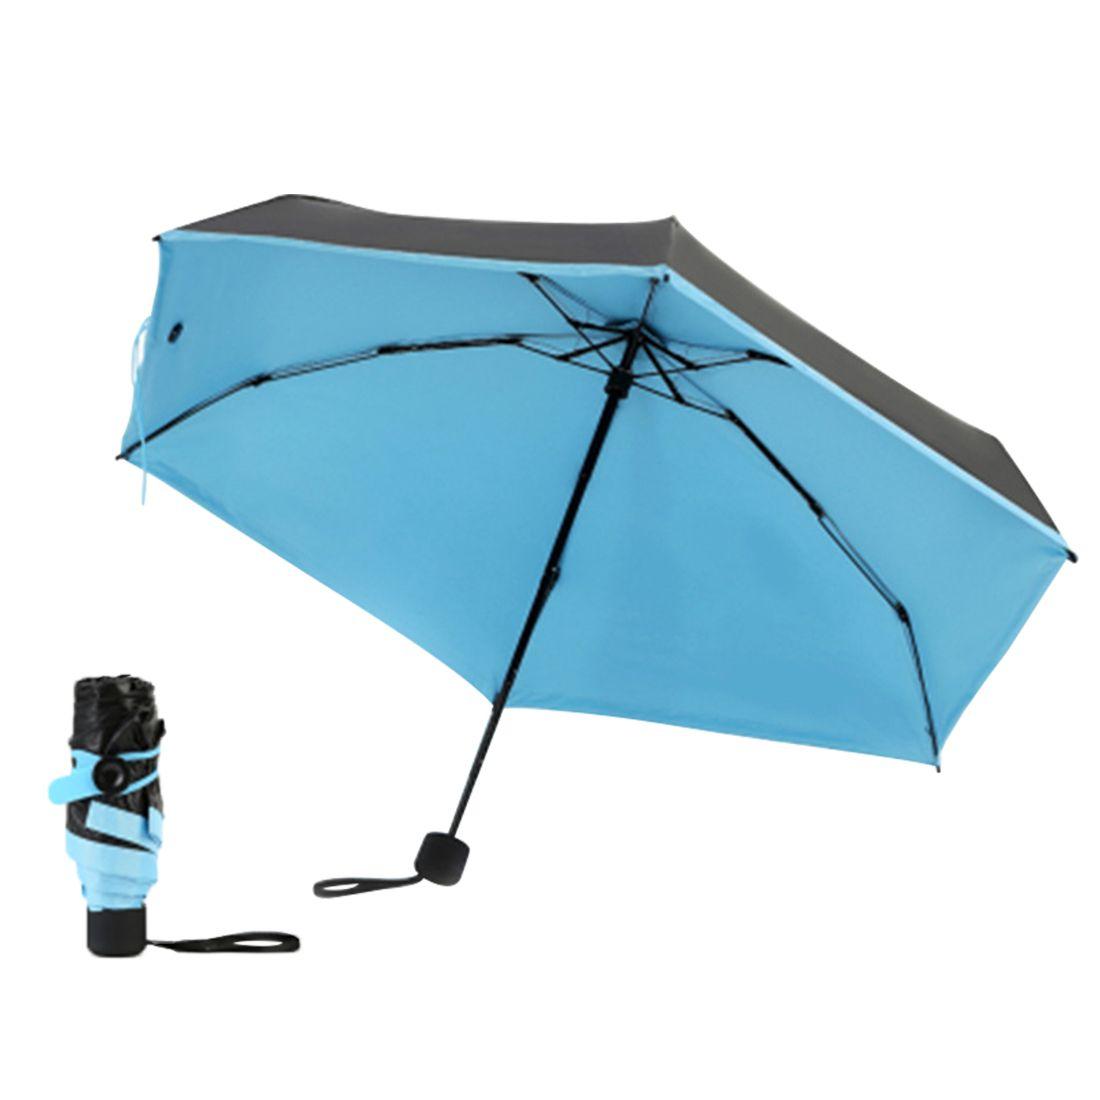 17a3a86c1f50 New Mini Pocket Umbrella Women Sunny and Rainy Mini Fashion Folding  Umbrellas 210g Small Sun Parasol Umbrella